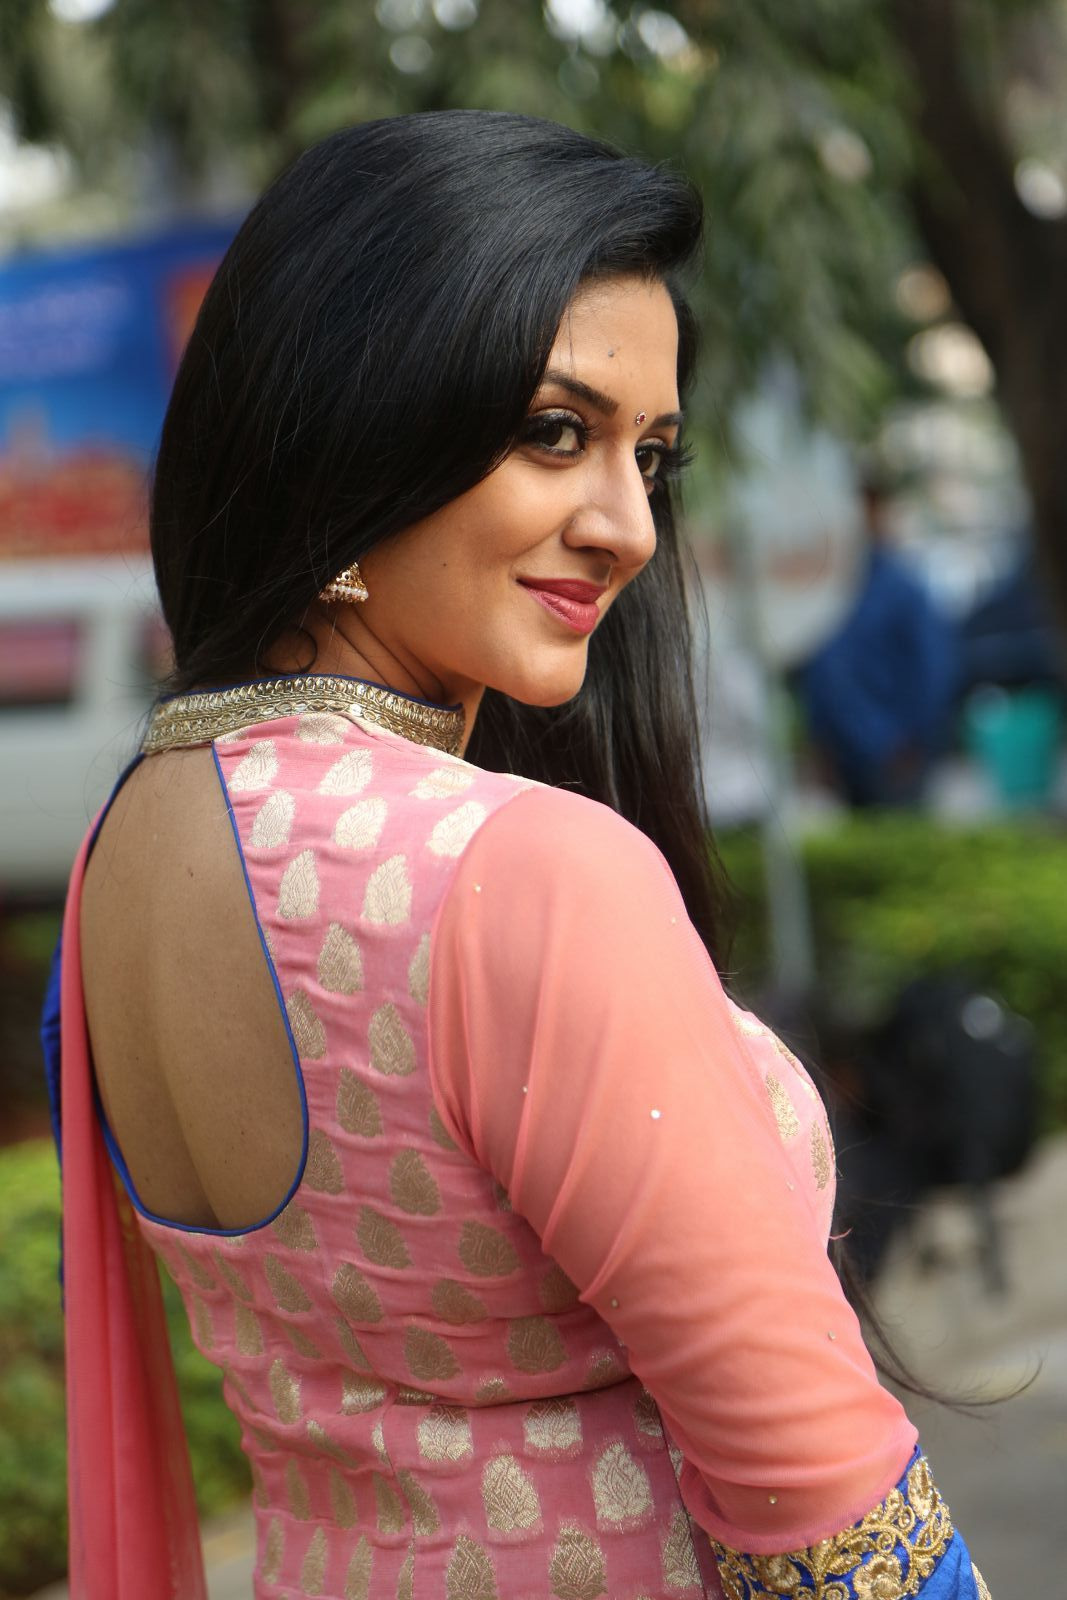 Brand New Photo Stills Of Beautiful Actress Vimala | Film Industry